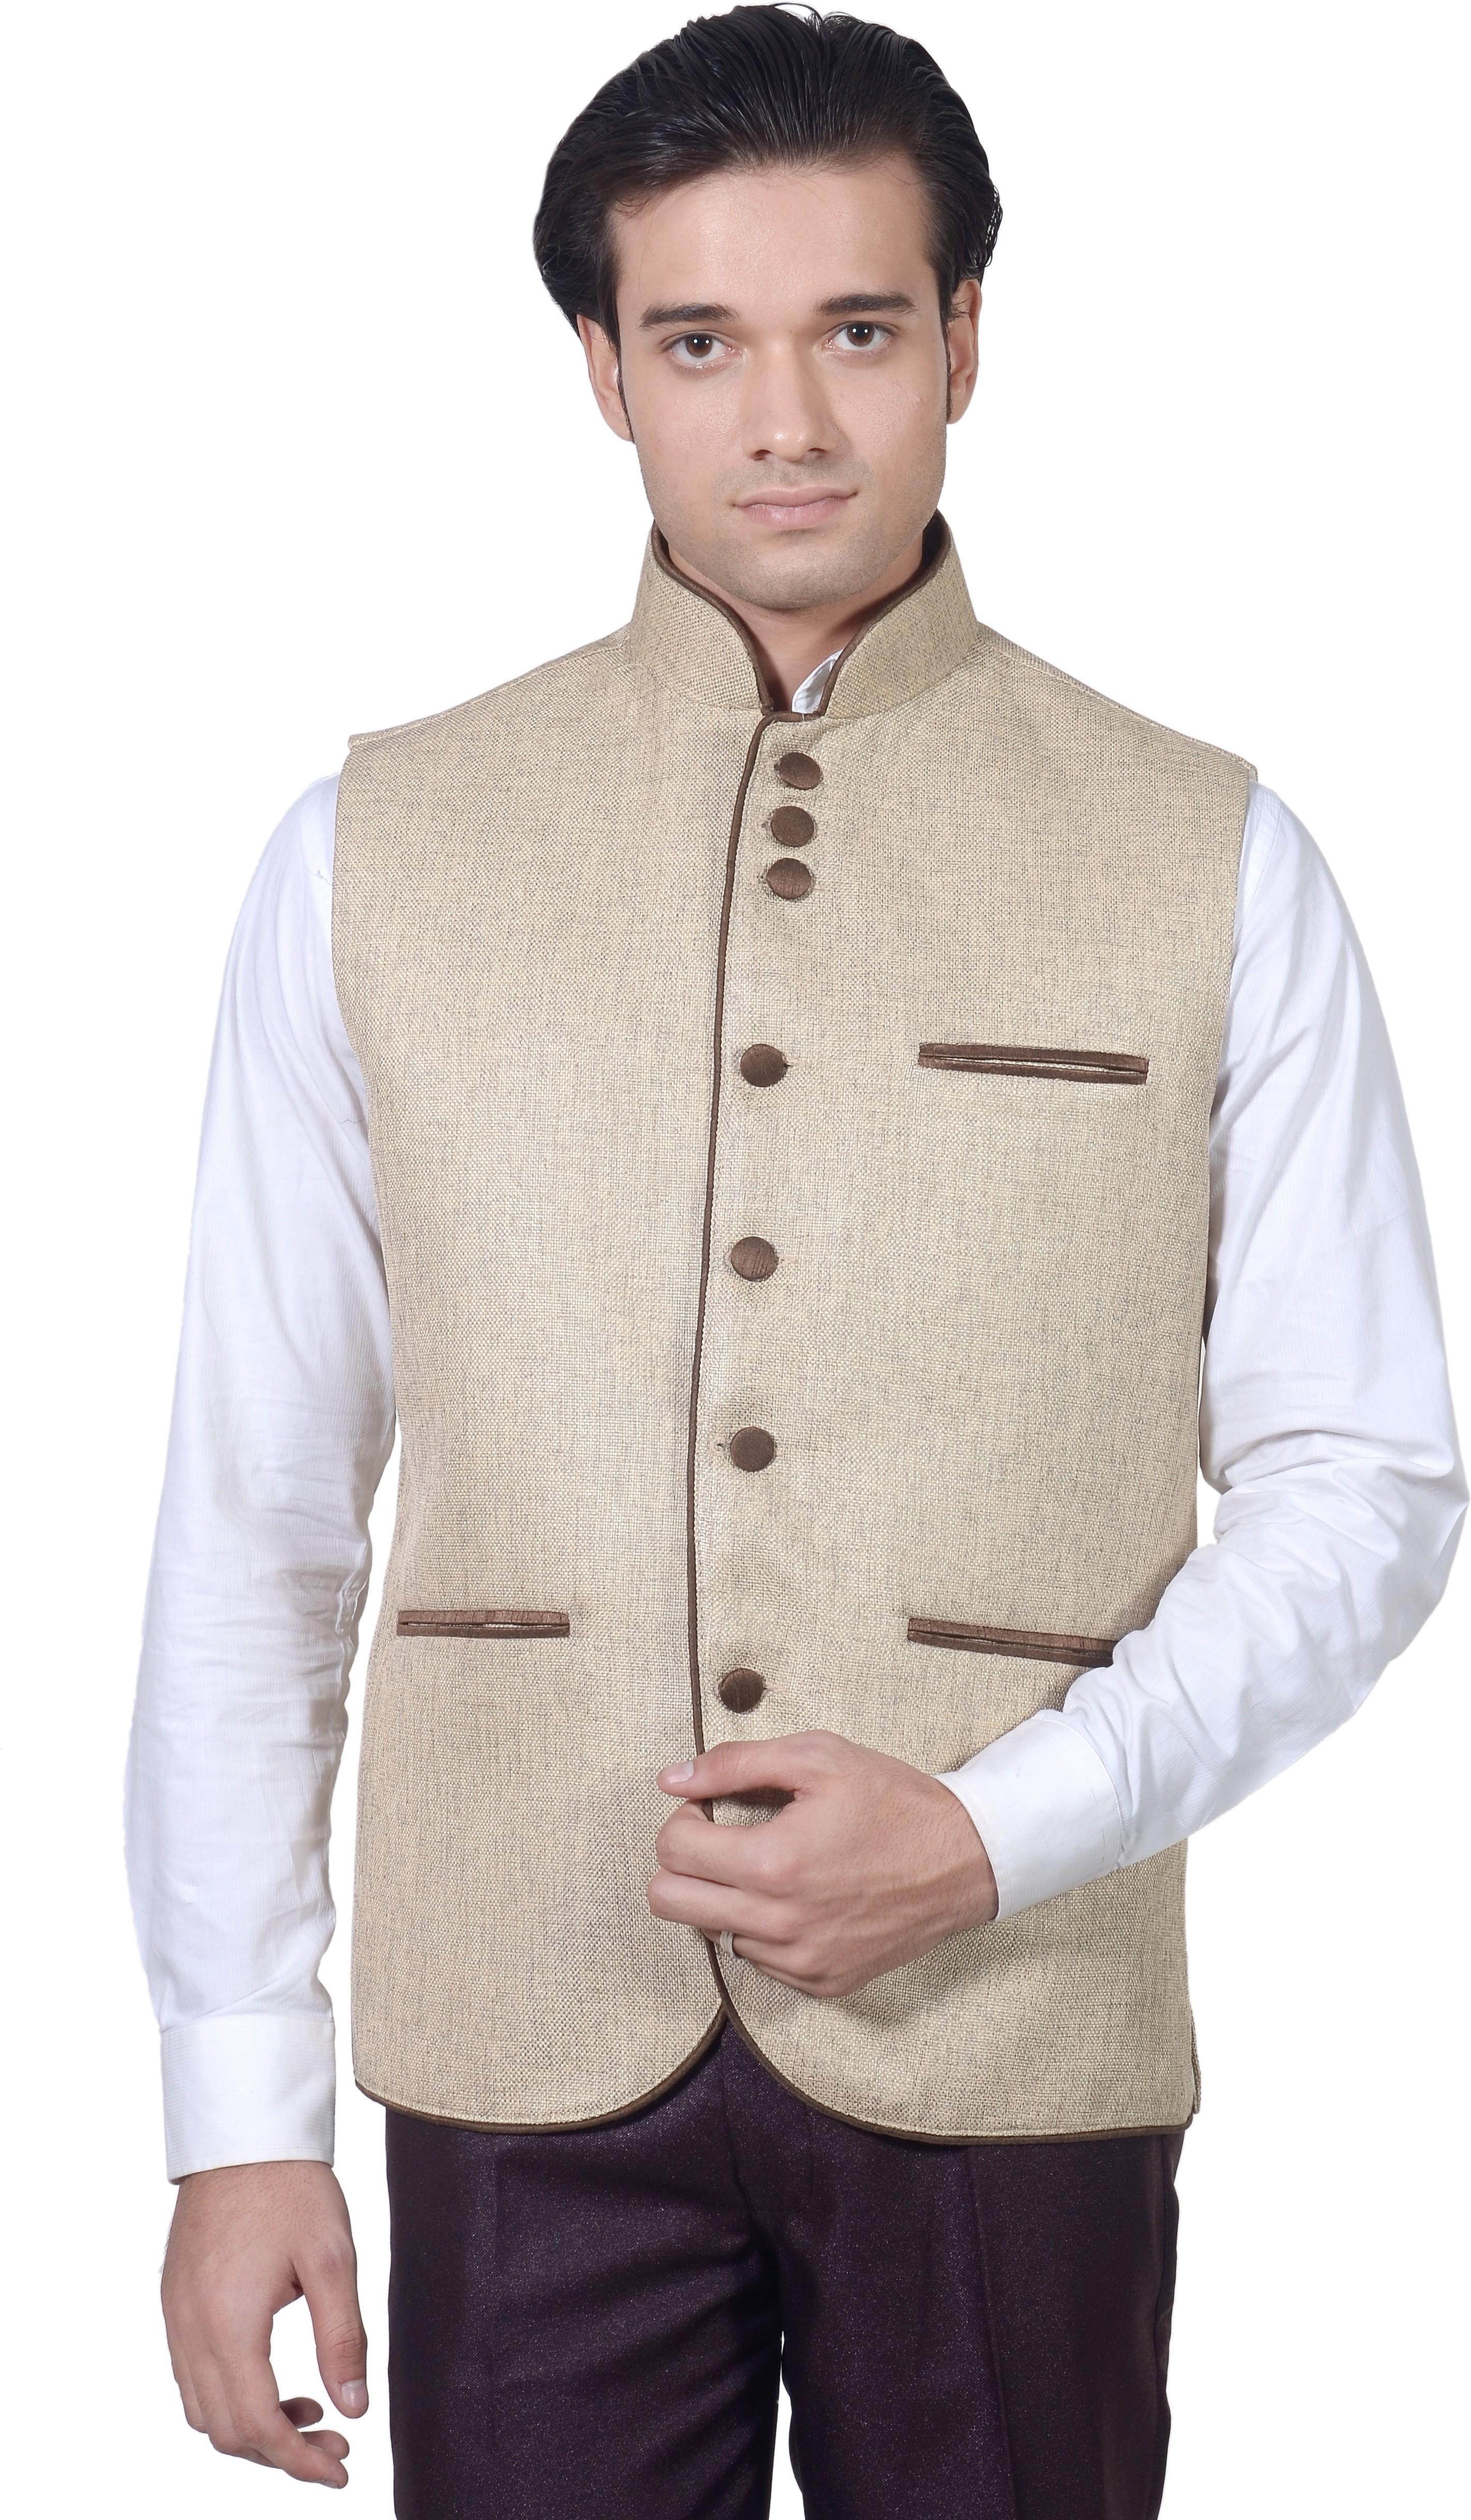 Amafhh Sleeveless Solid Men's Nehru Jacket - Knit Wear